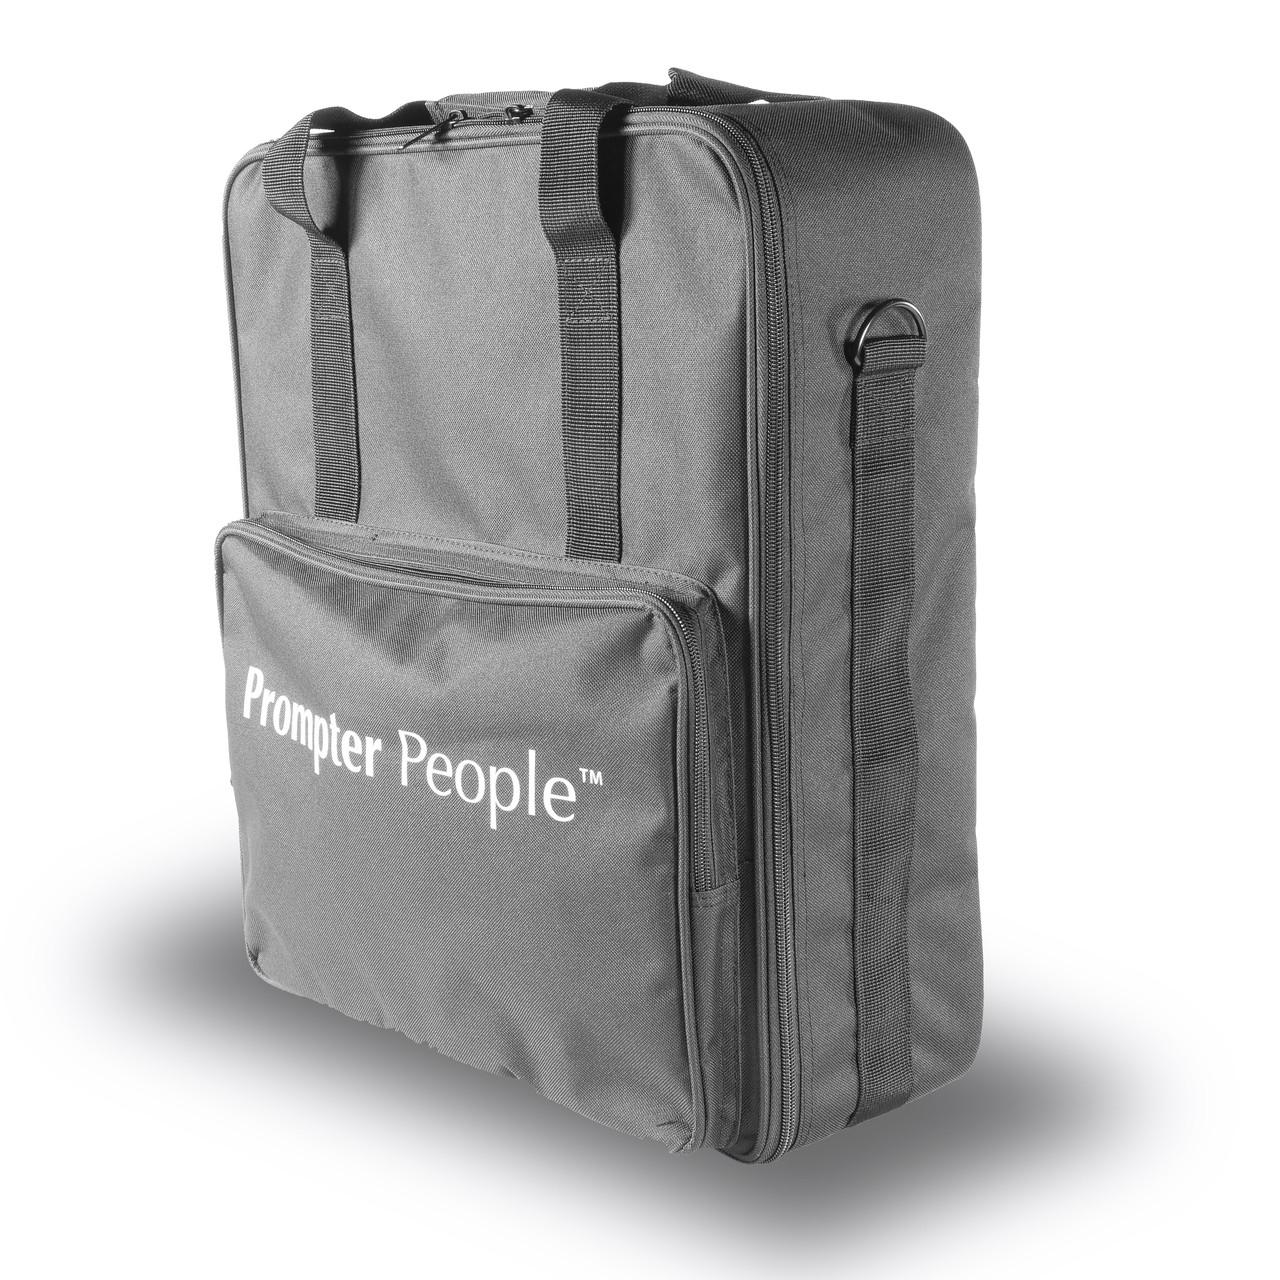 Prompter Pal Soft Bag Closed